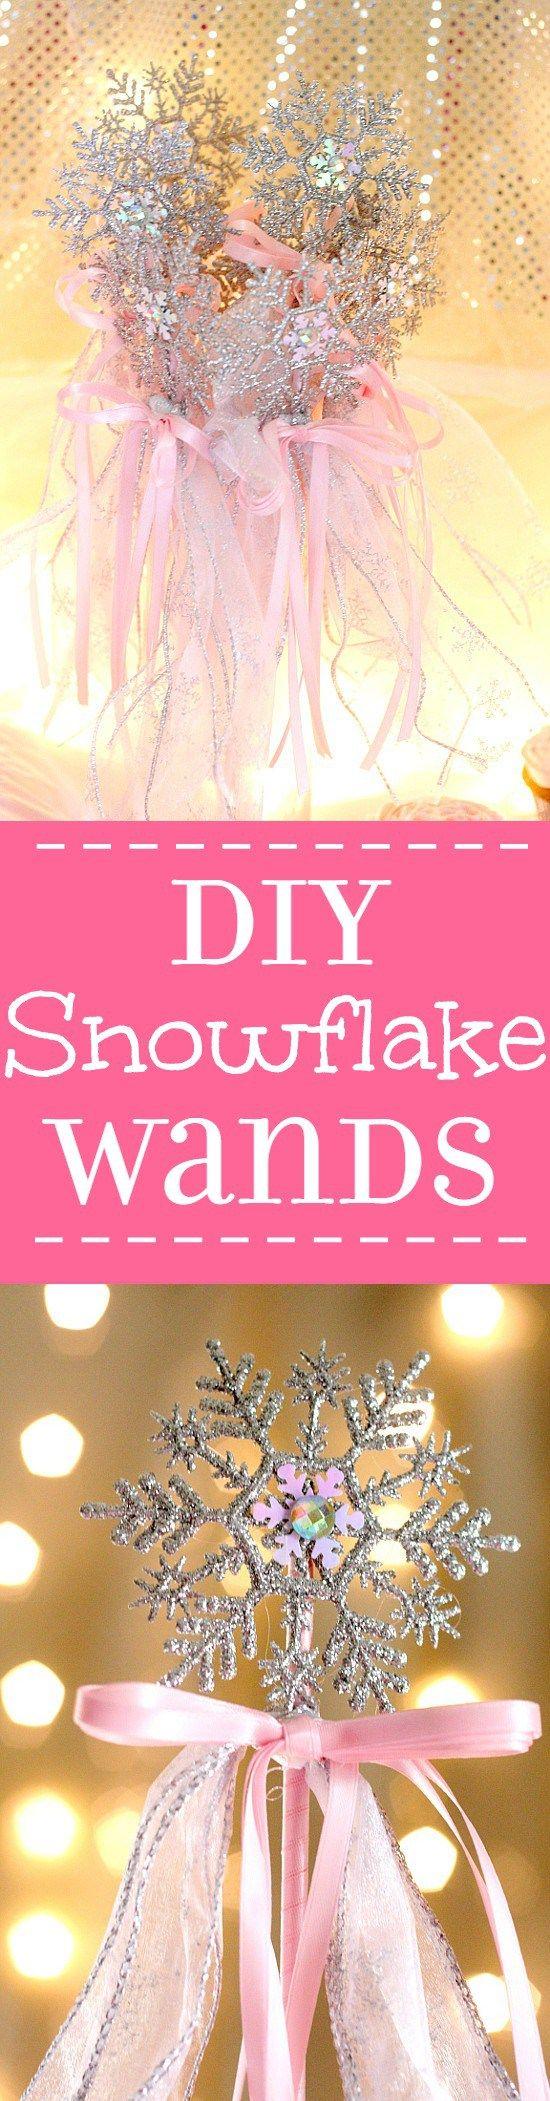 DIY Snowflake Wands